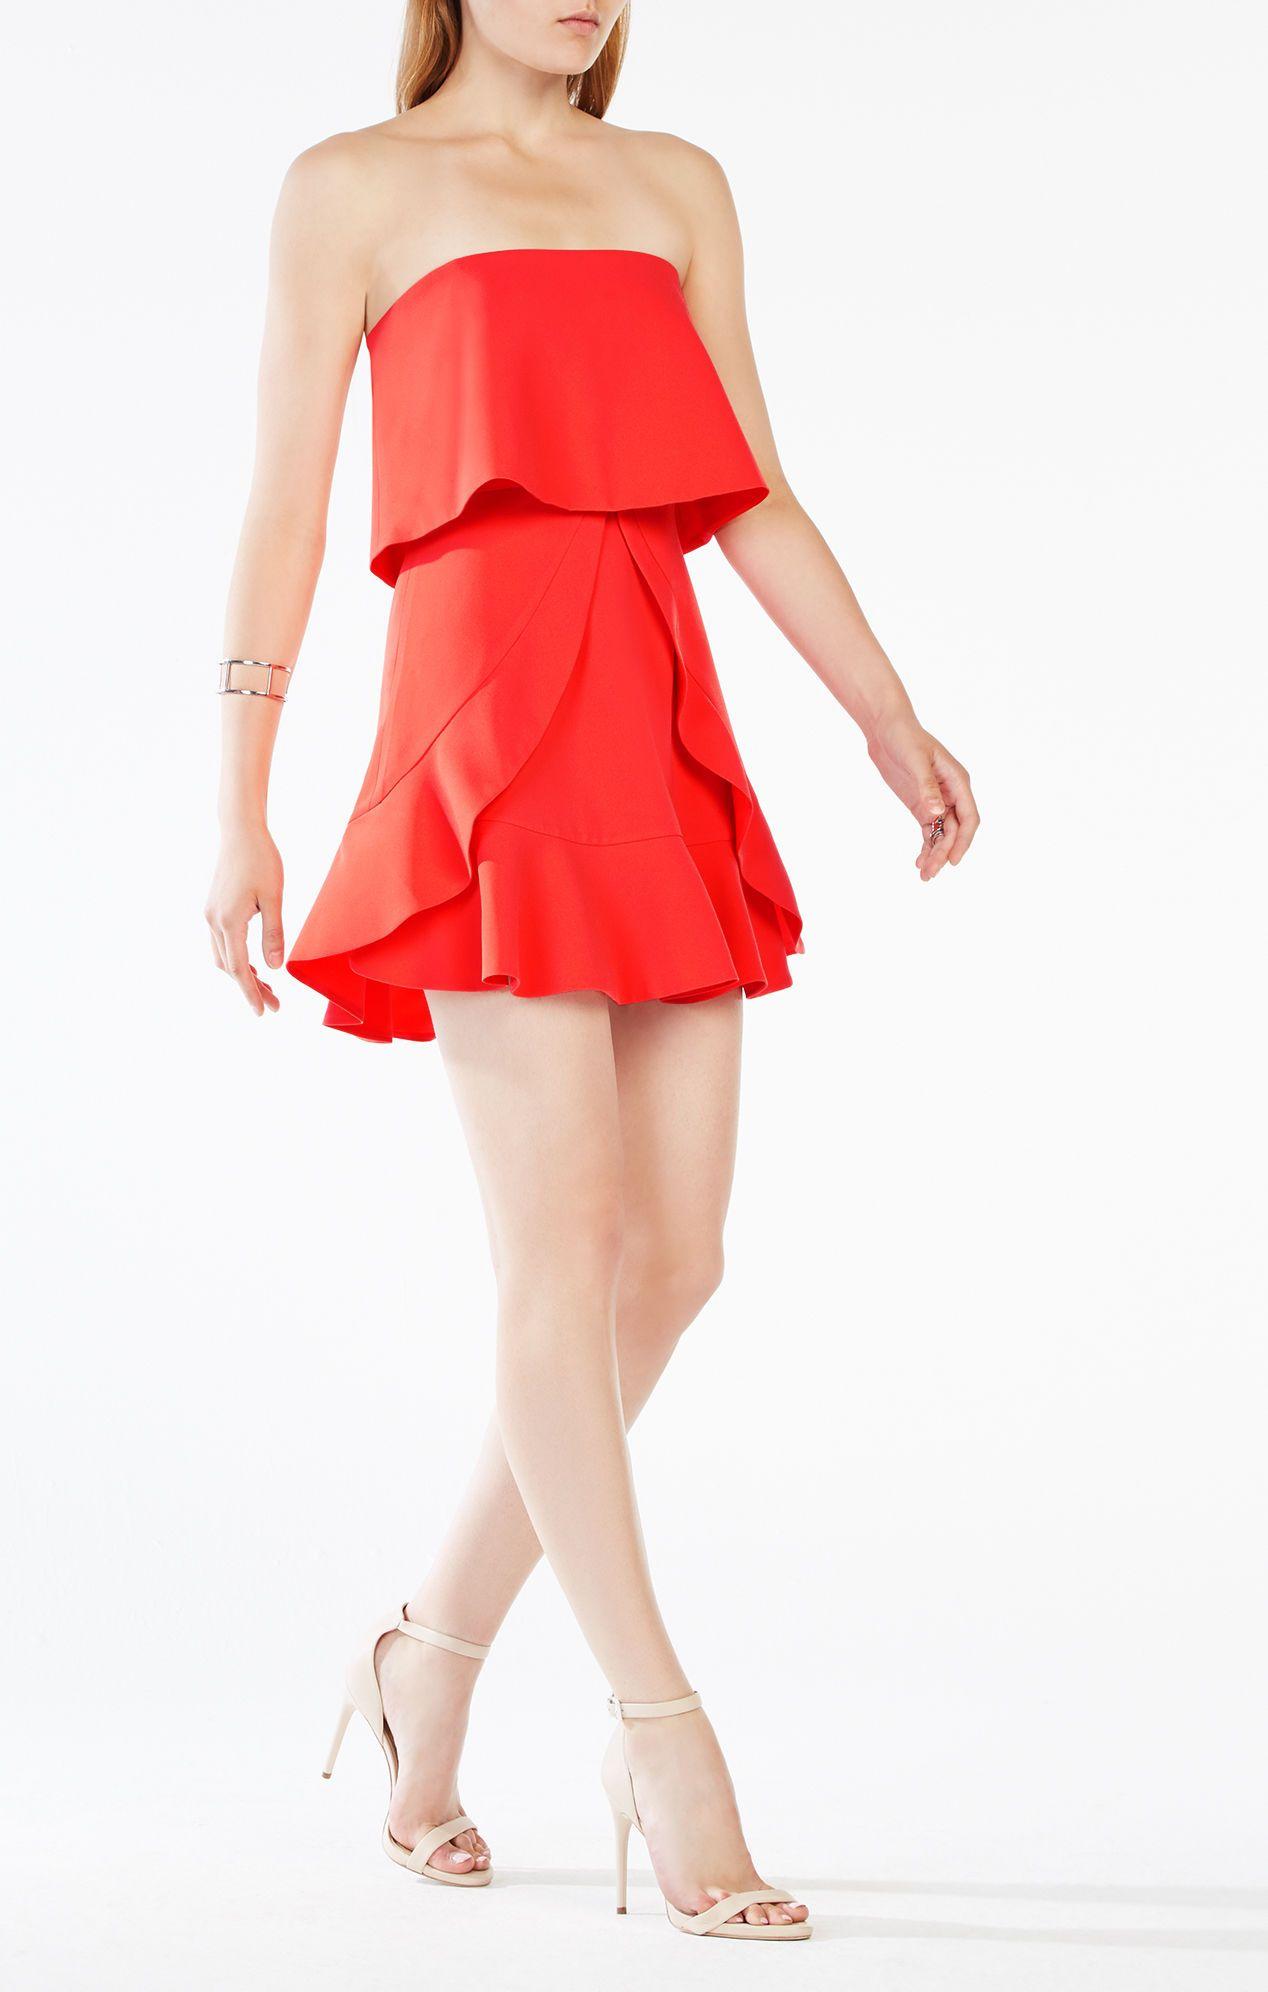 Charlot Strapless Ruffle Dress Strapless Ruffle Dress Flounced Dress Strapless Cocktail Dresses [ 1992 x 1268 Pixel ]